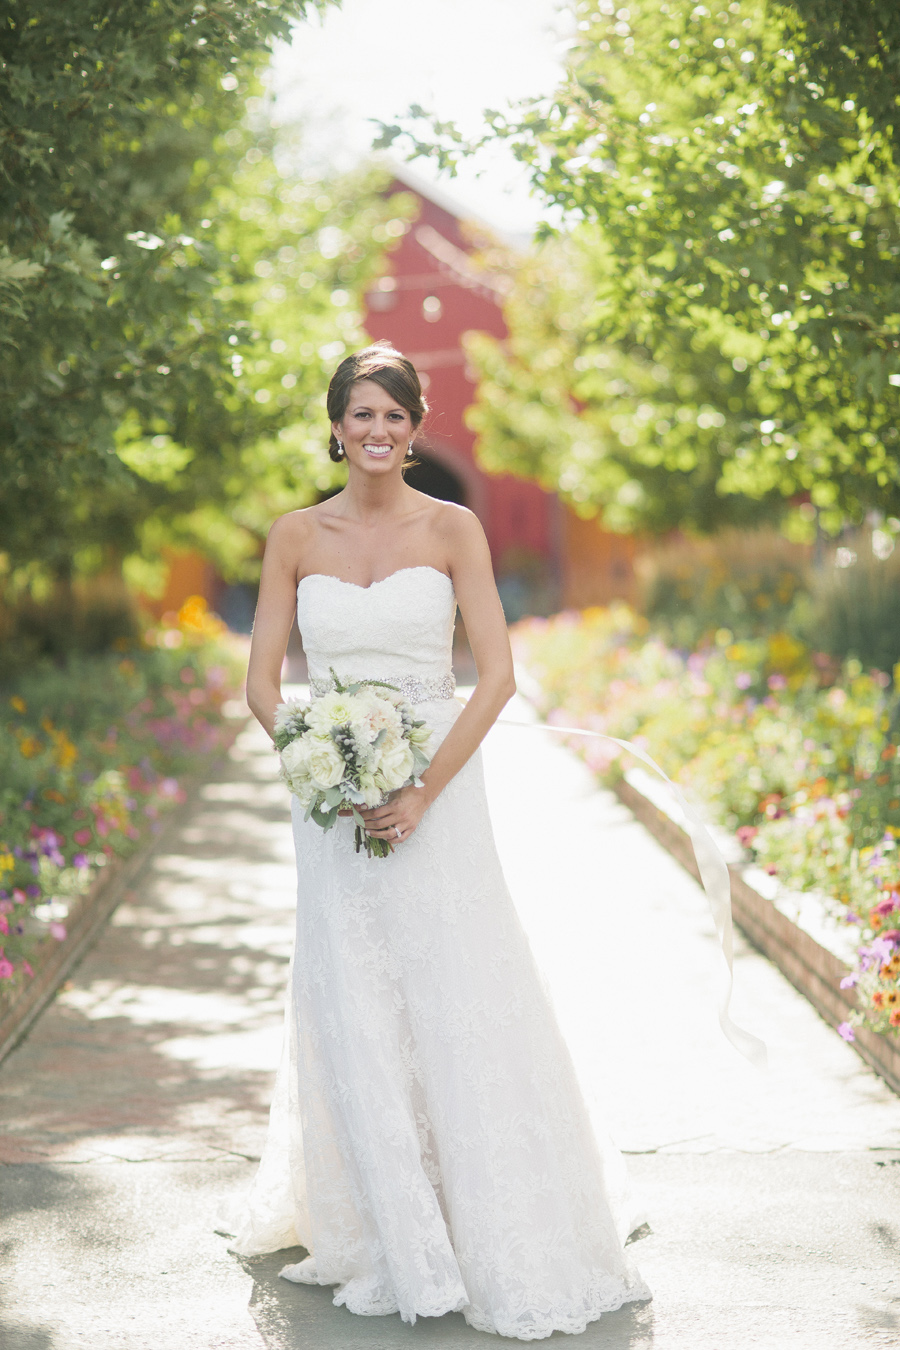 Emily_Todd_LarkspurColorado_Wedding_10.jpg